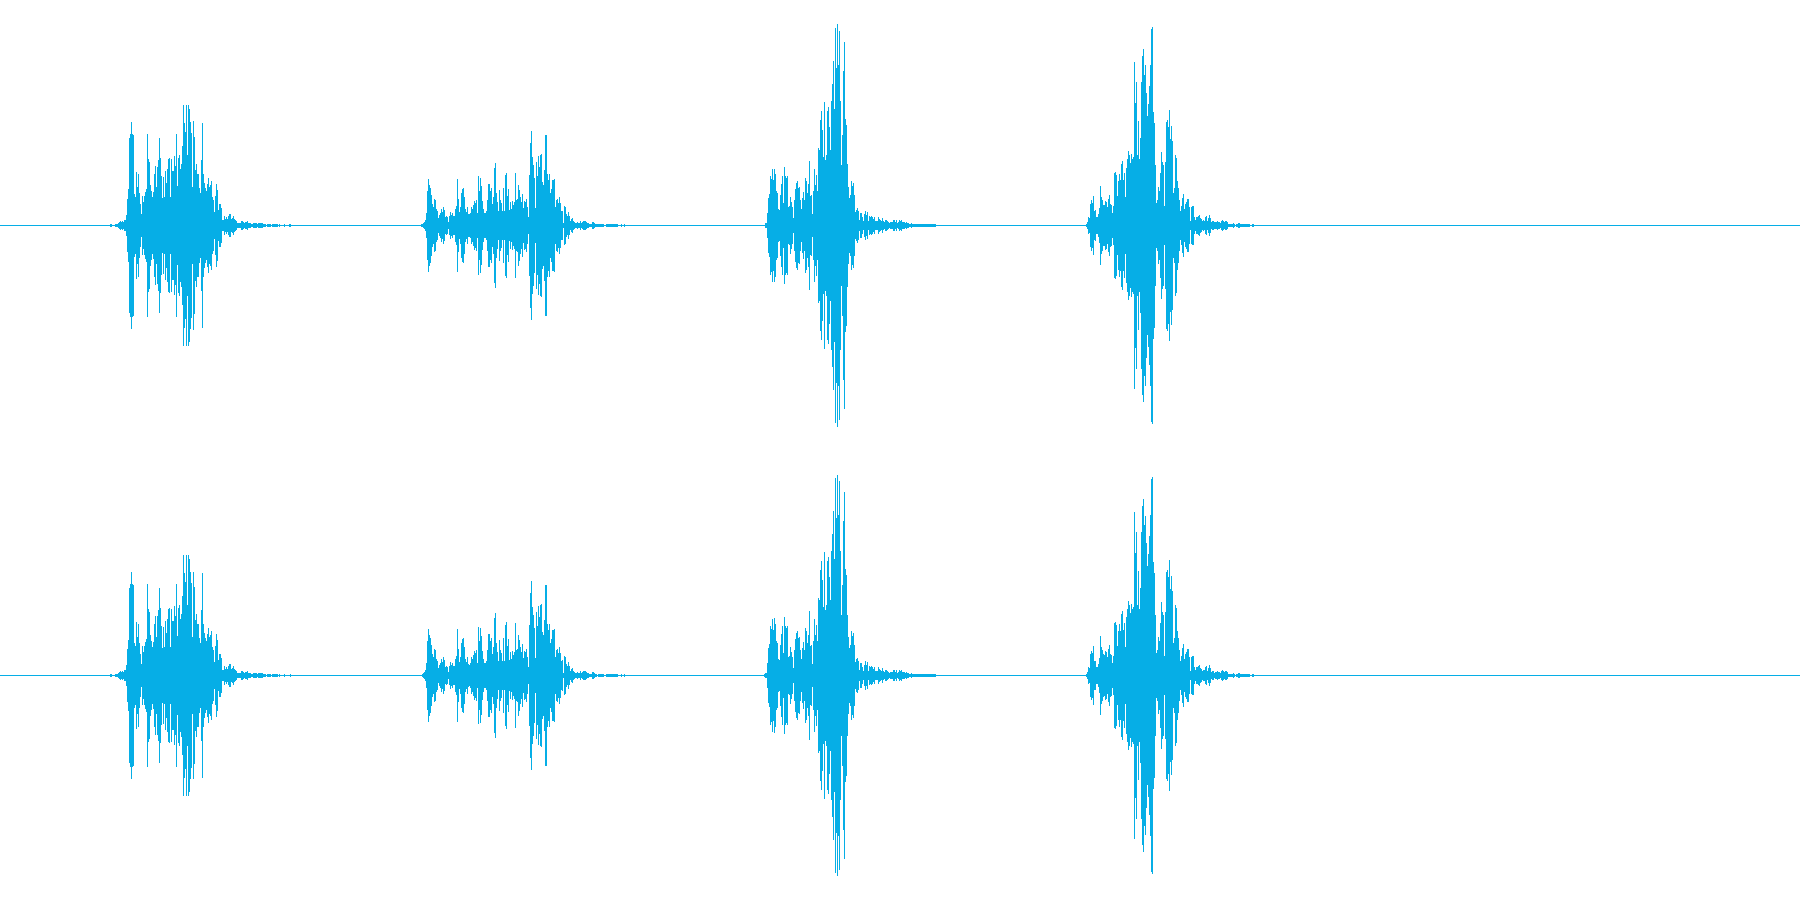 PC マウス03-19(スクロール 速)の再生済みの波形